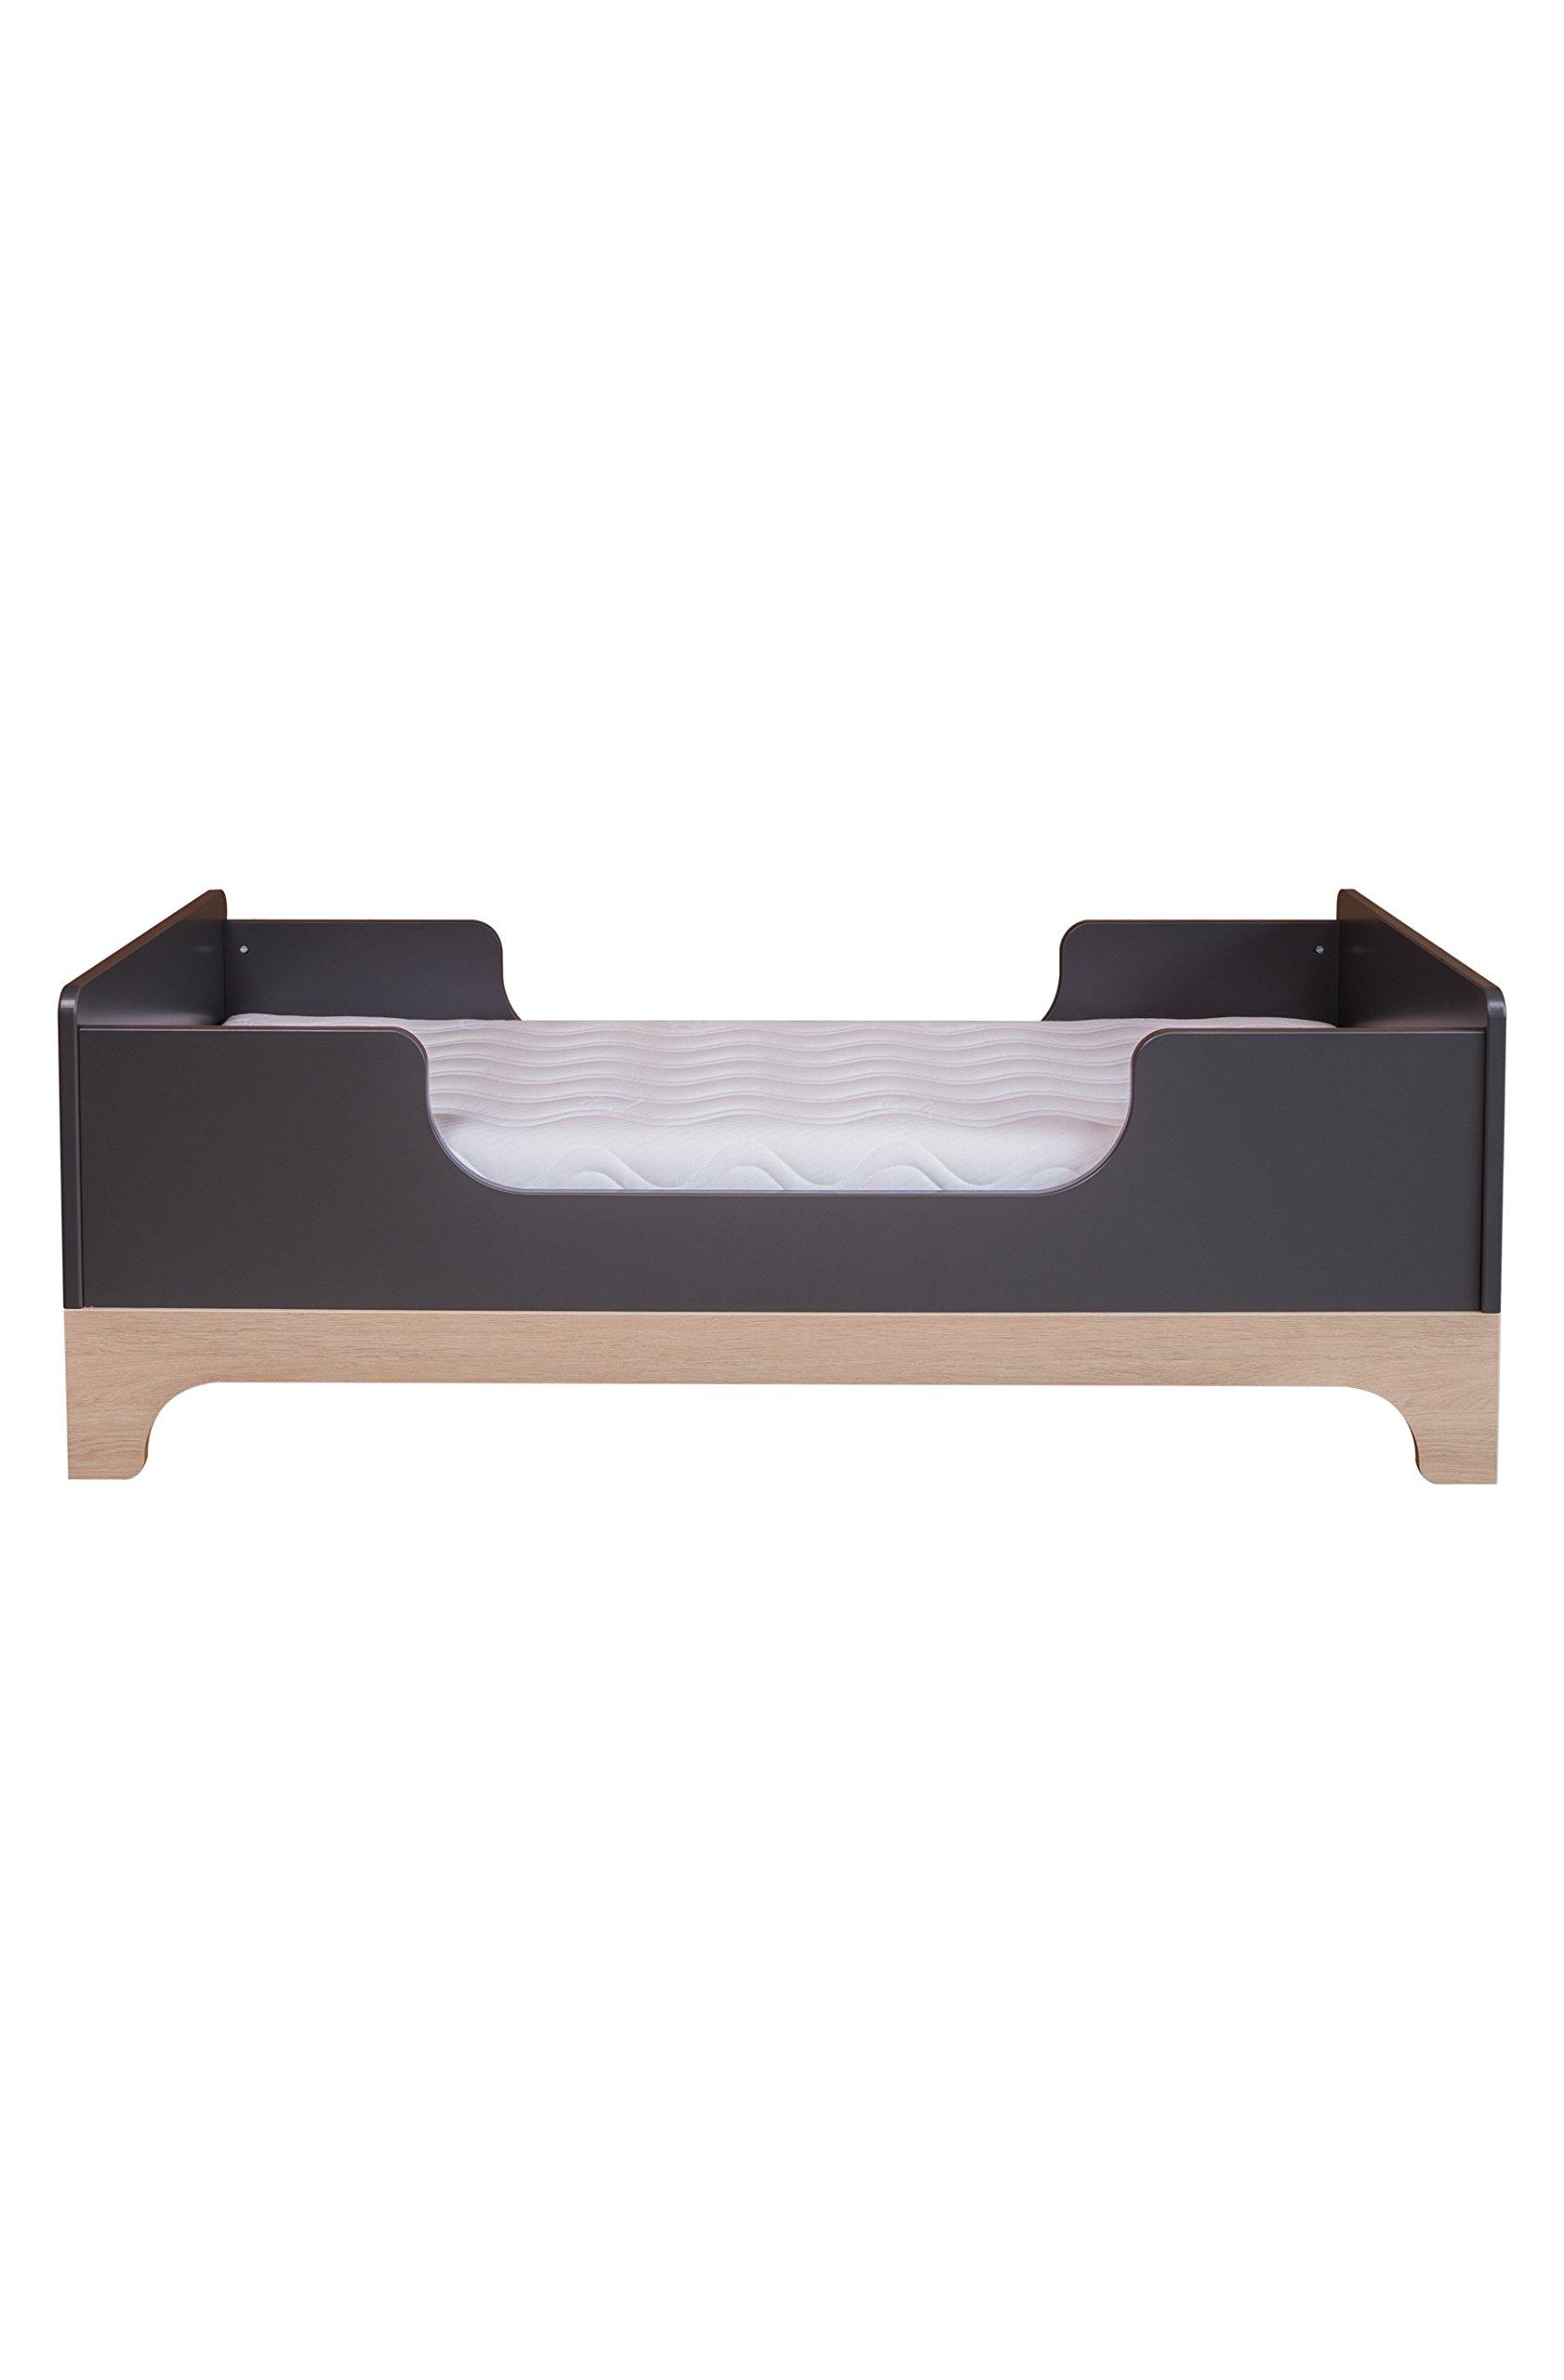 Kadolis Calvi Convertible Bed - 70 x 140 cm Antracita/Madera   3